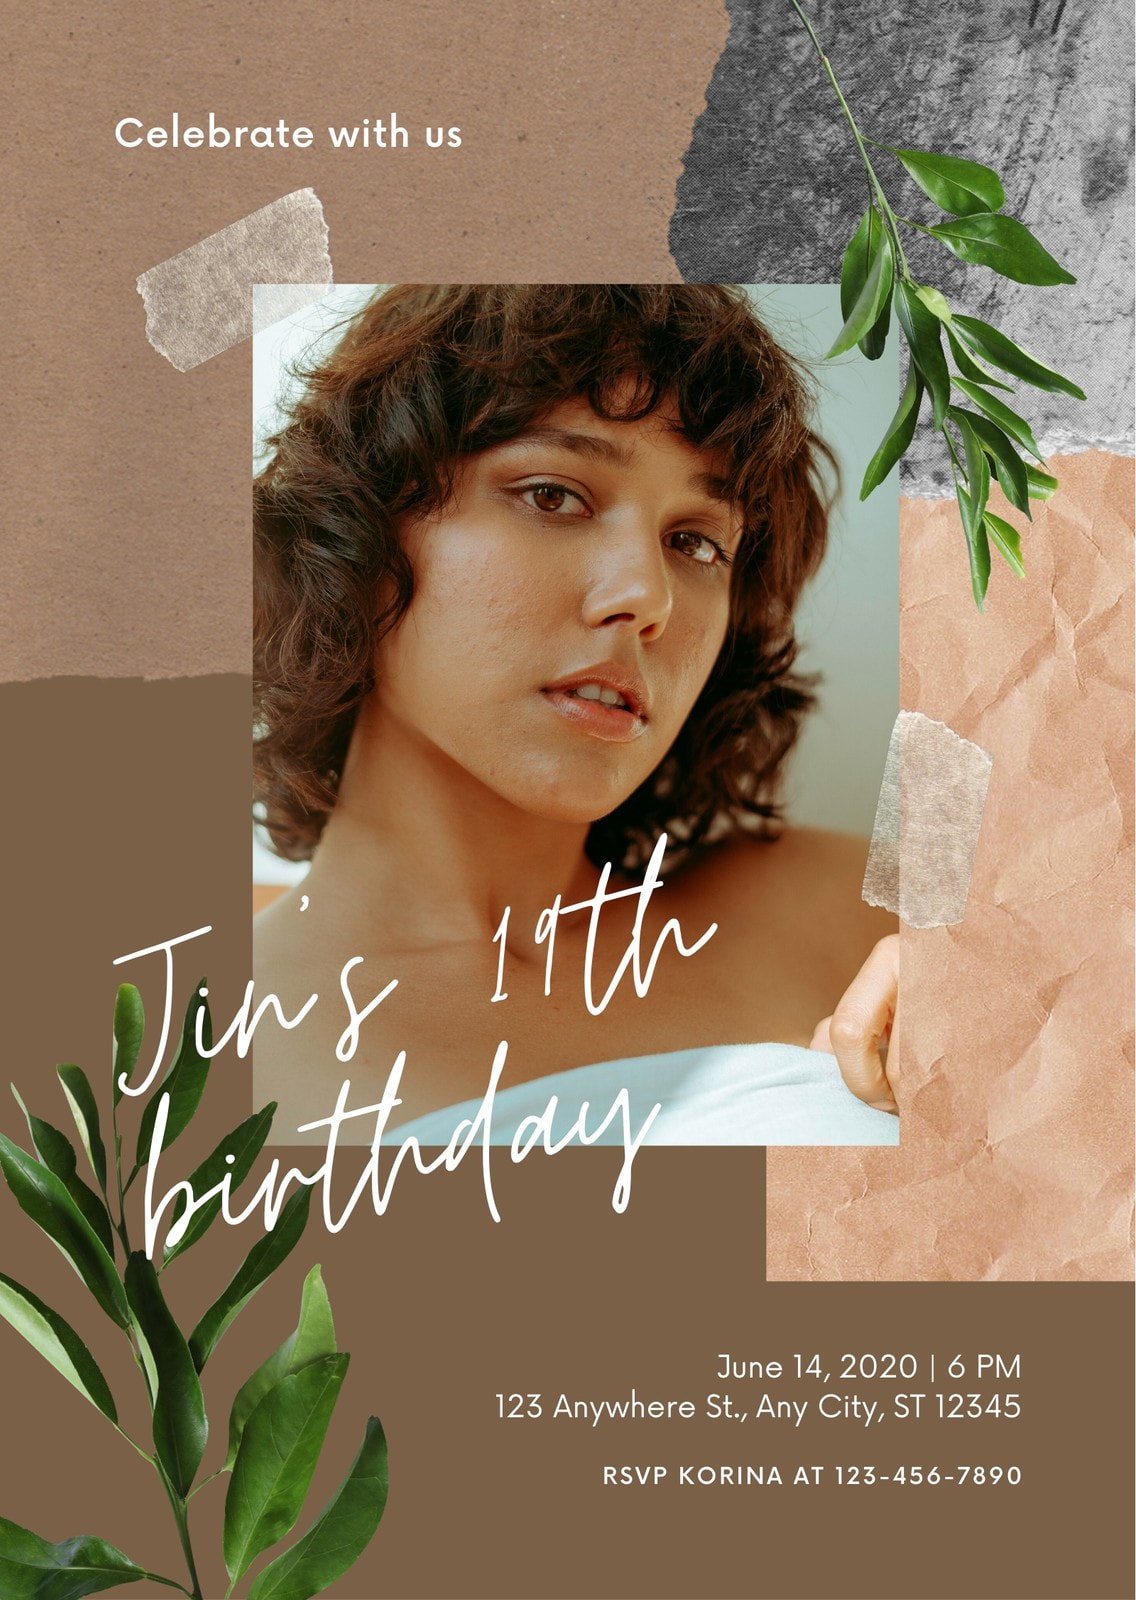 Brown Woman Photo Modern Scrapbook Portrait Birthday Invitation